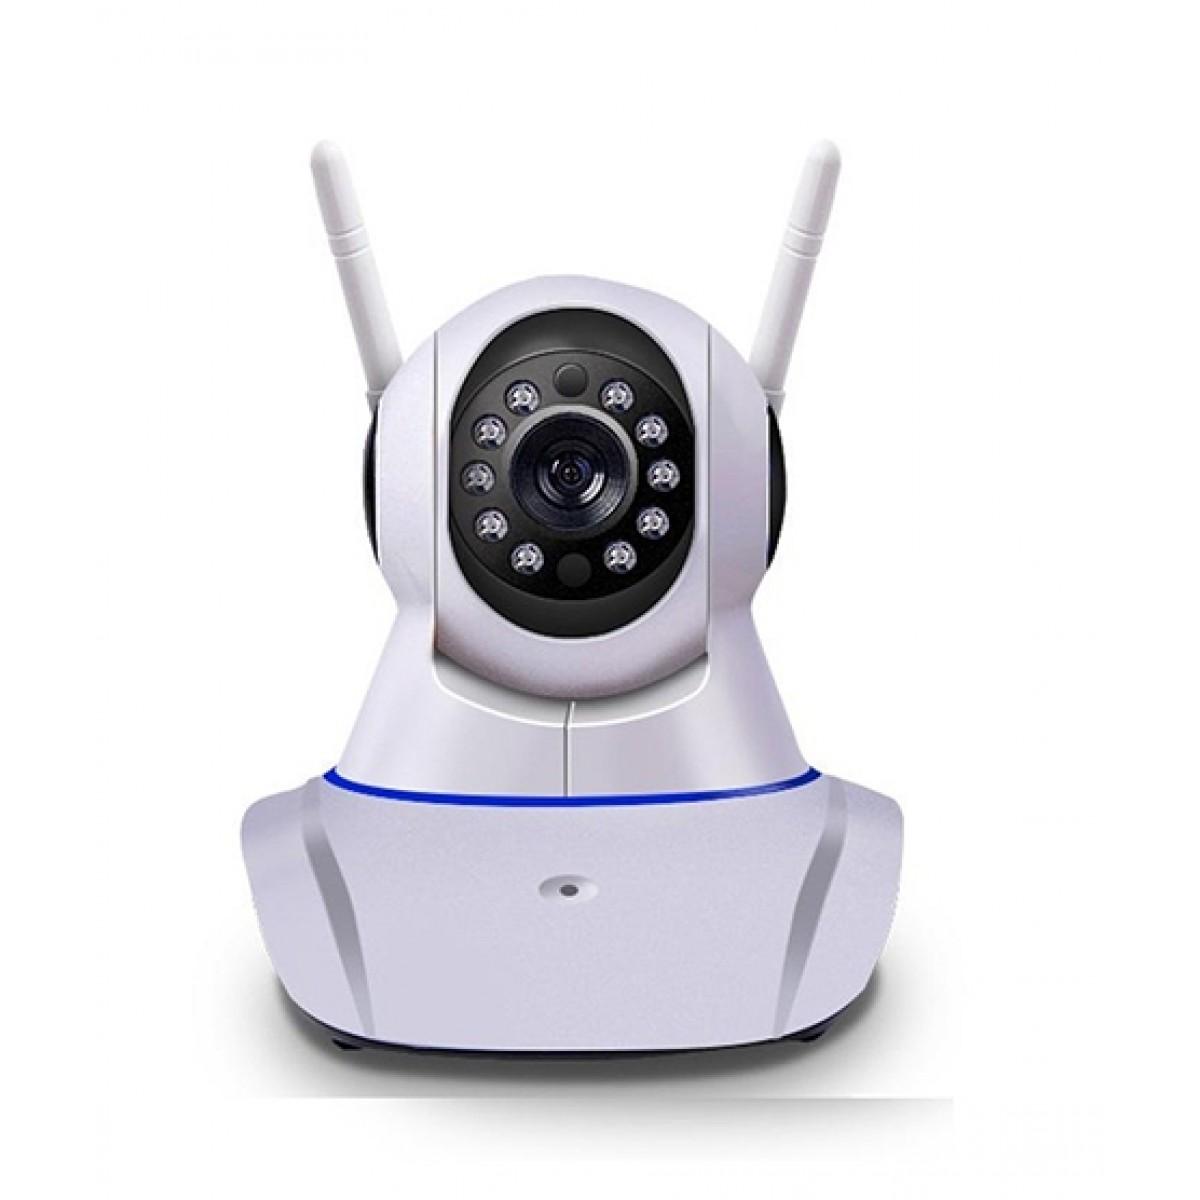 IP WiFi Smart 360 Camera - White